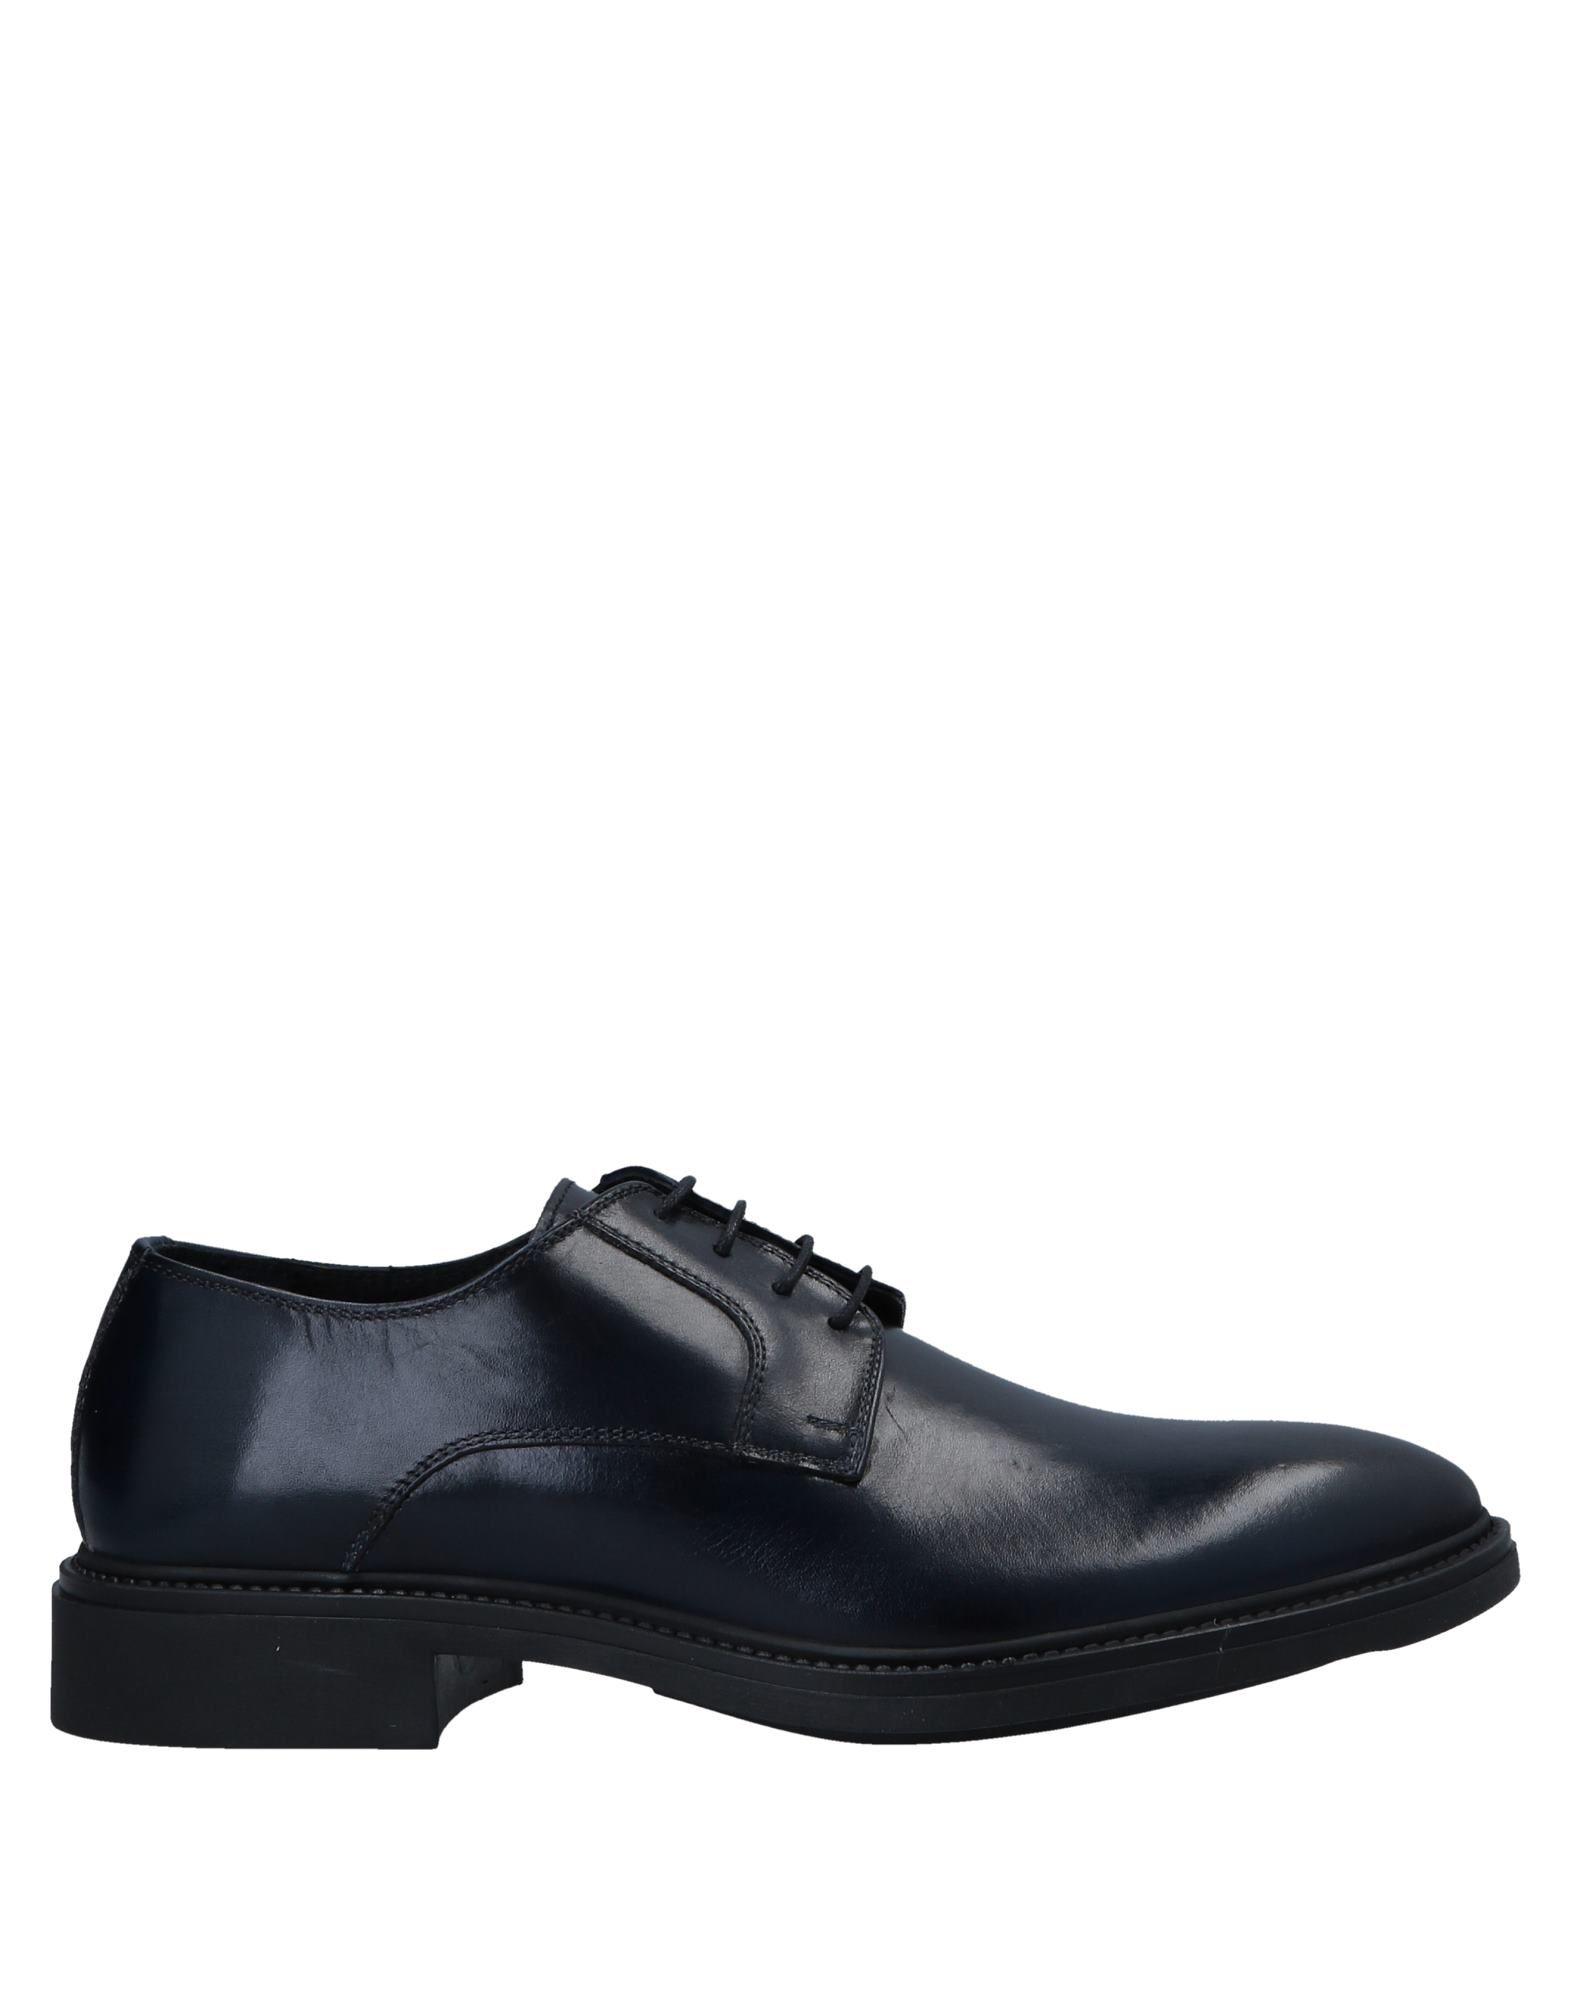 Rabatt echte Schuhe L&G Schnürschuhe Herren  11551025AO